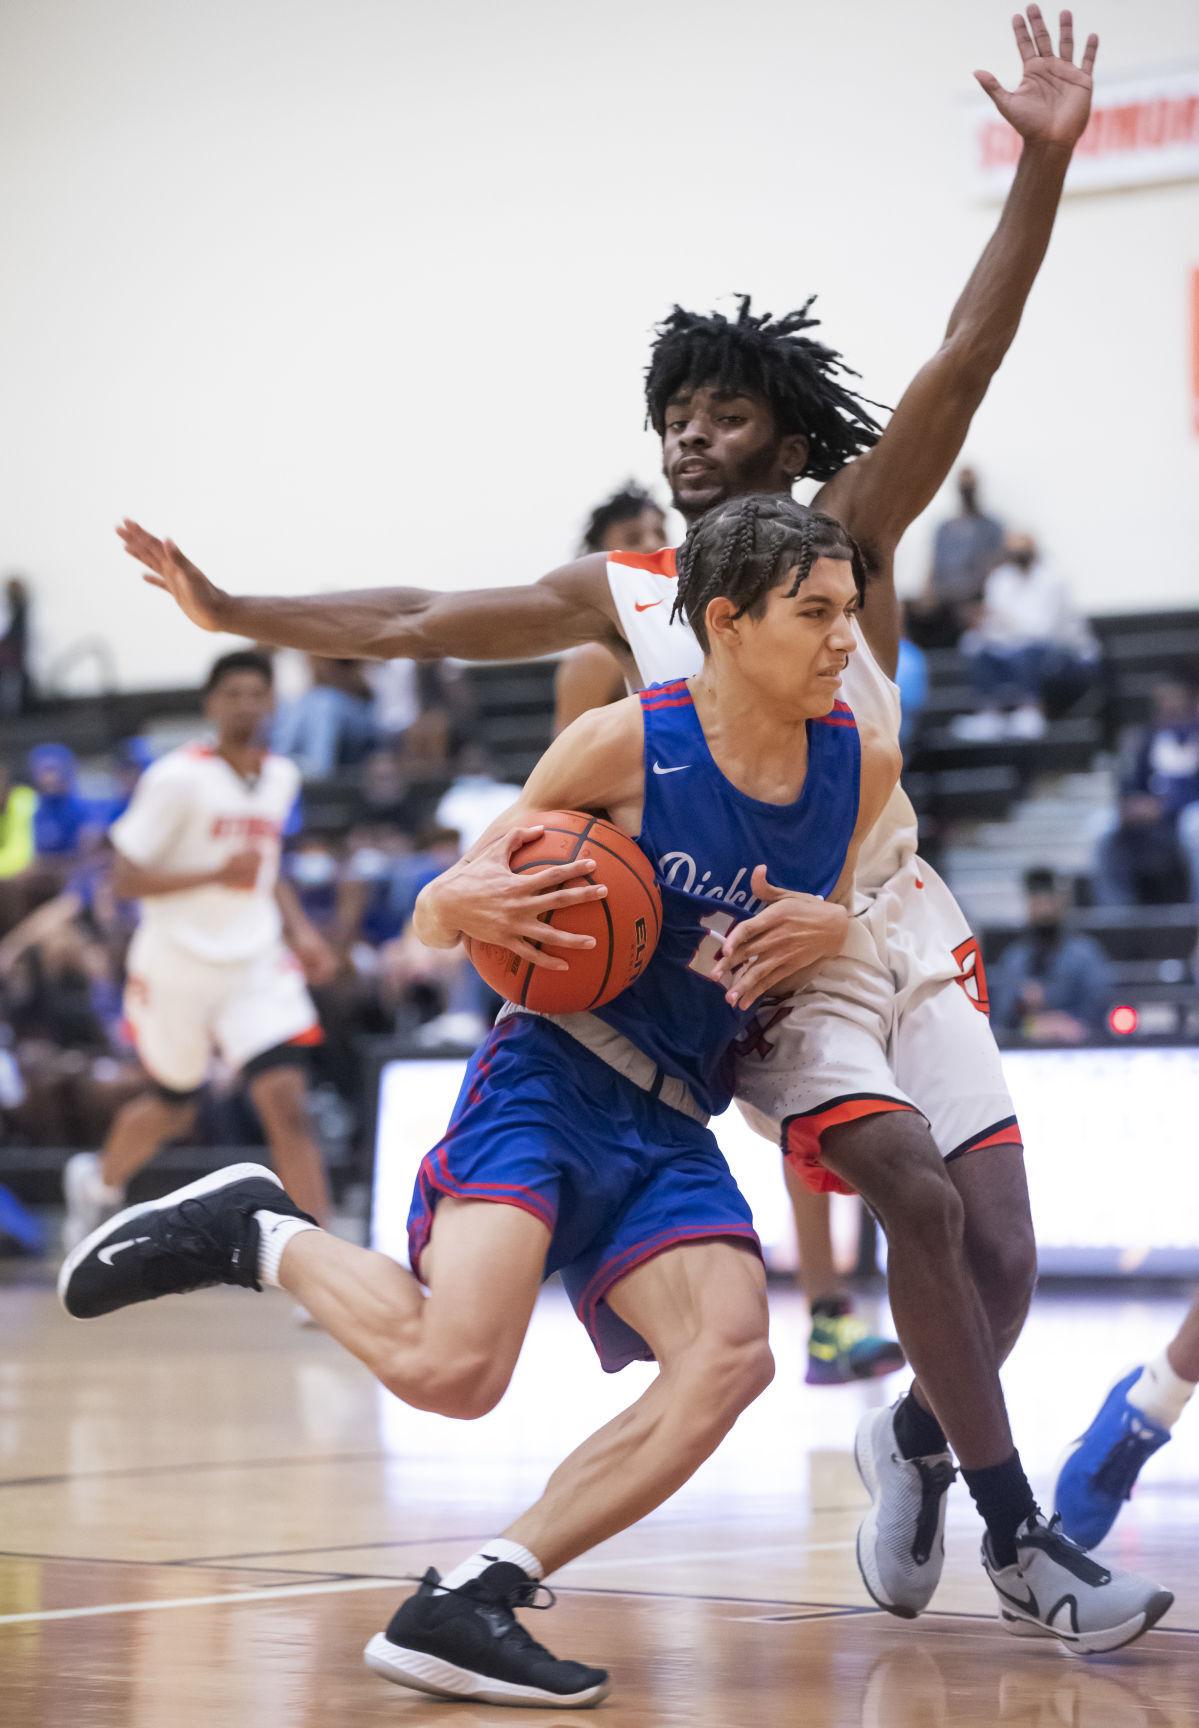 Texas City vs Dickinson Boys Basketball